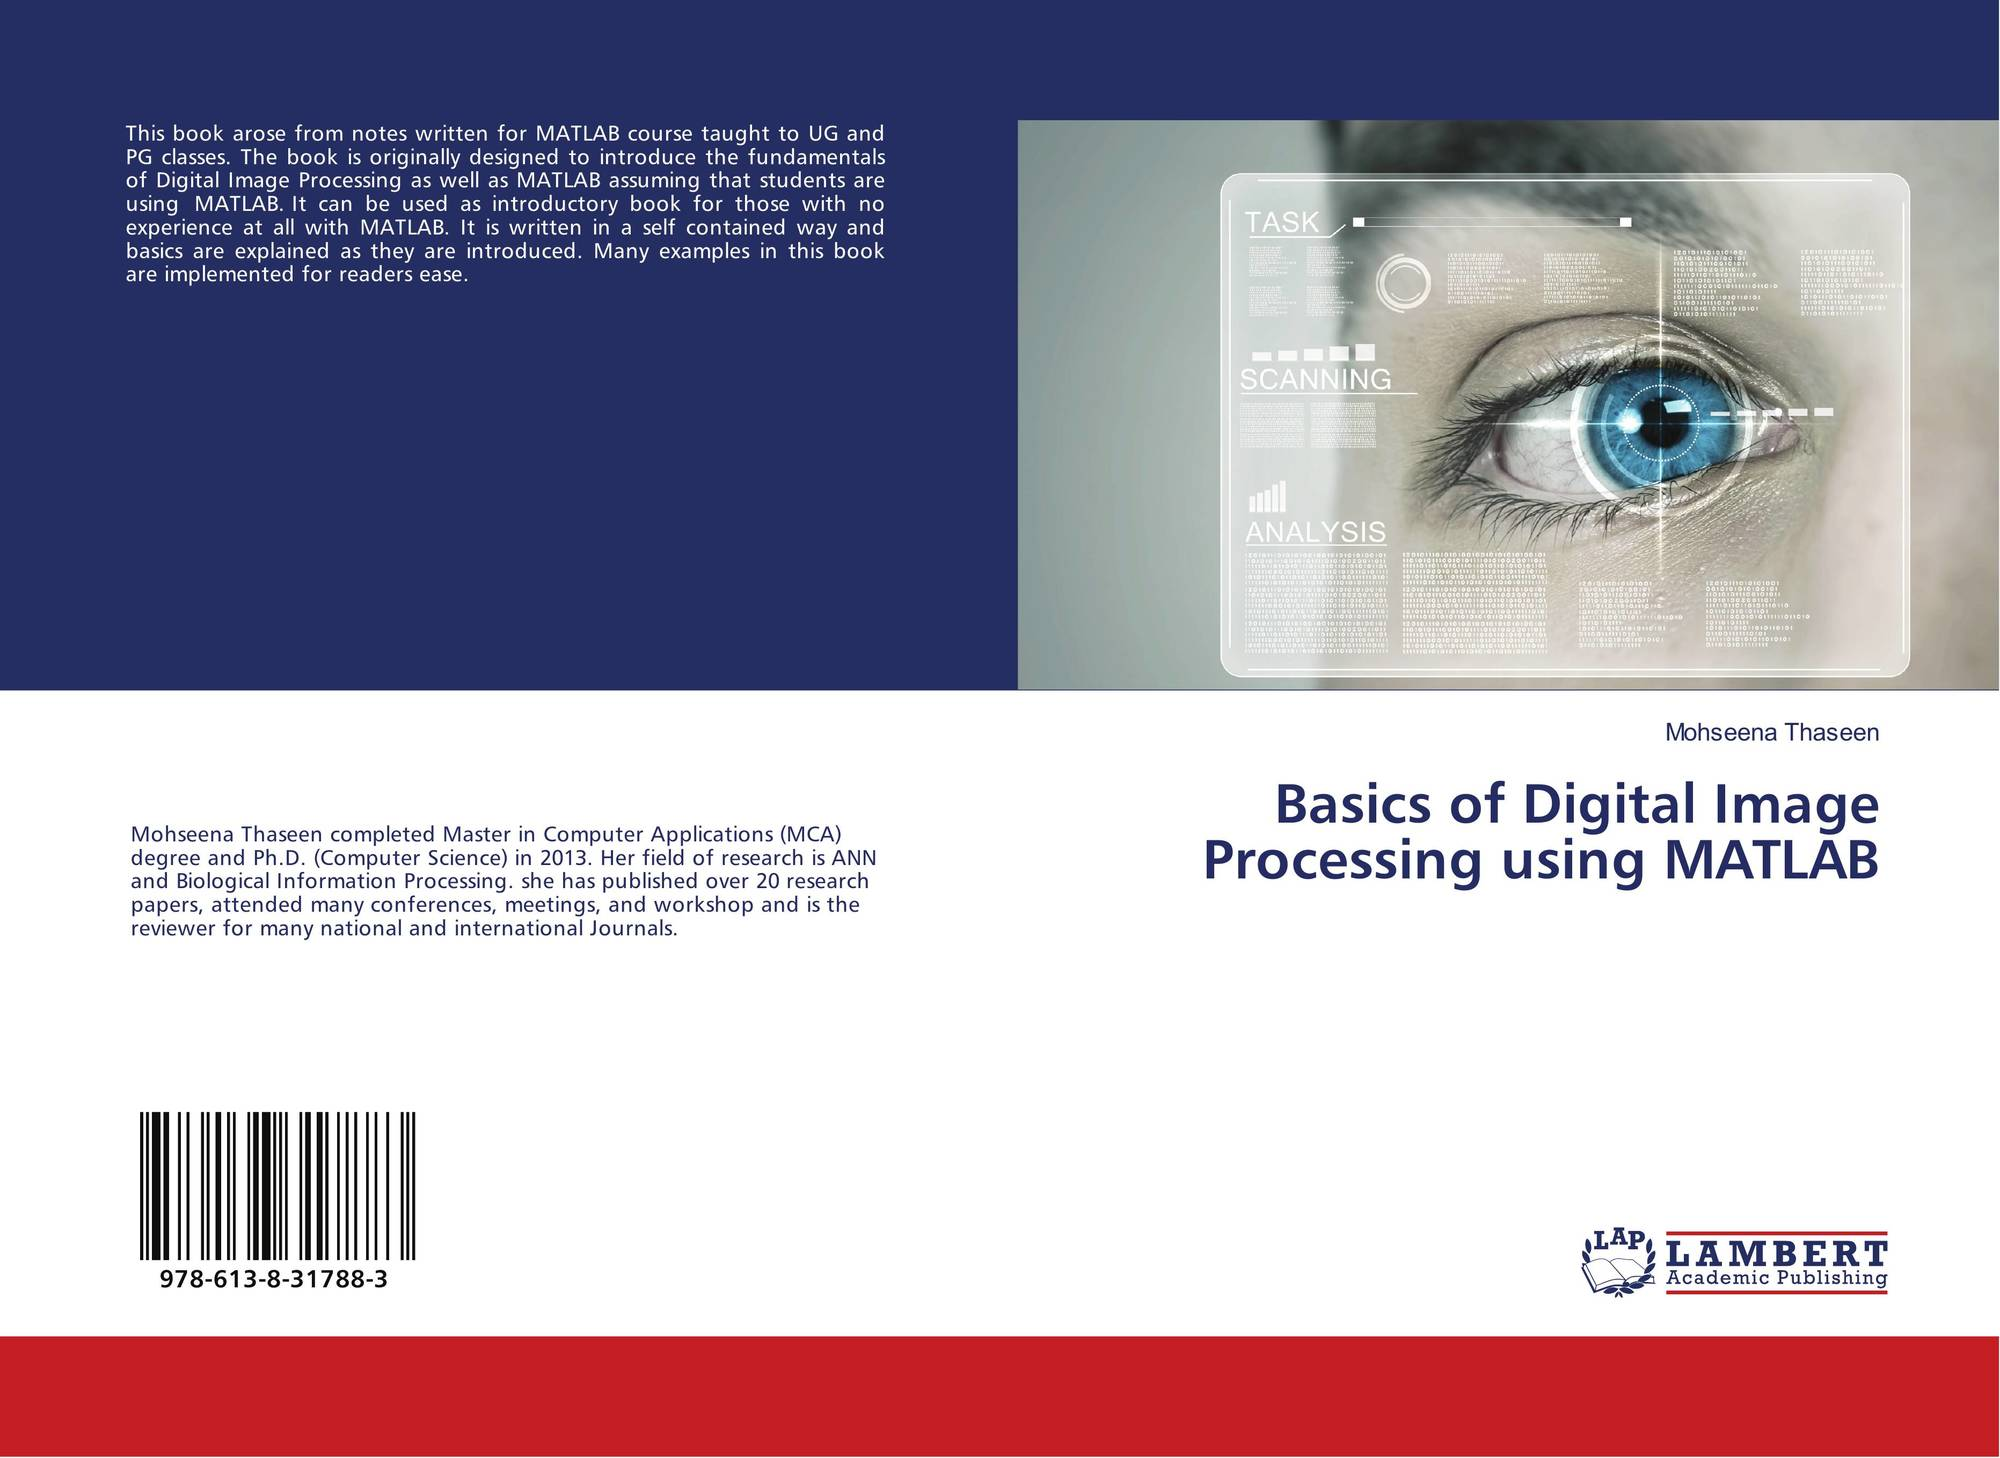 Basics of Digital Image Processing using MATLAB, 978-613-8